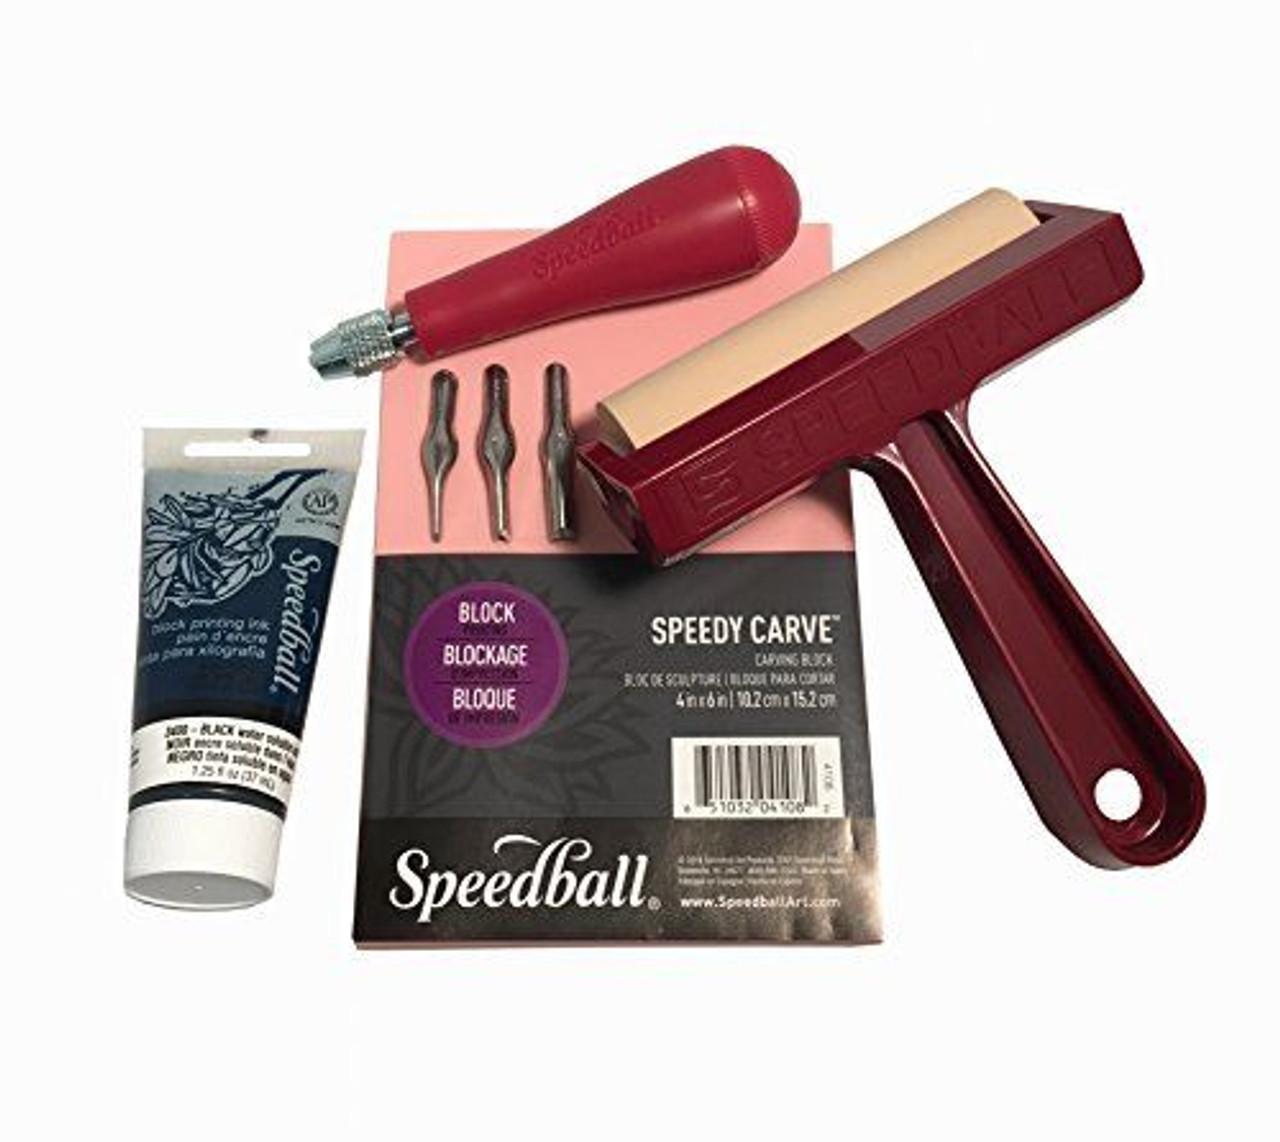 Speedball Block Printing Starter Kit